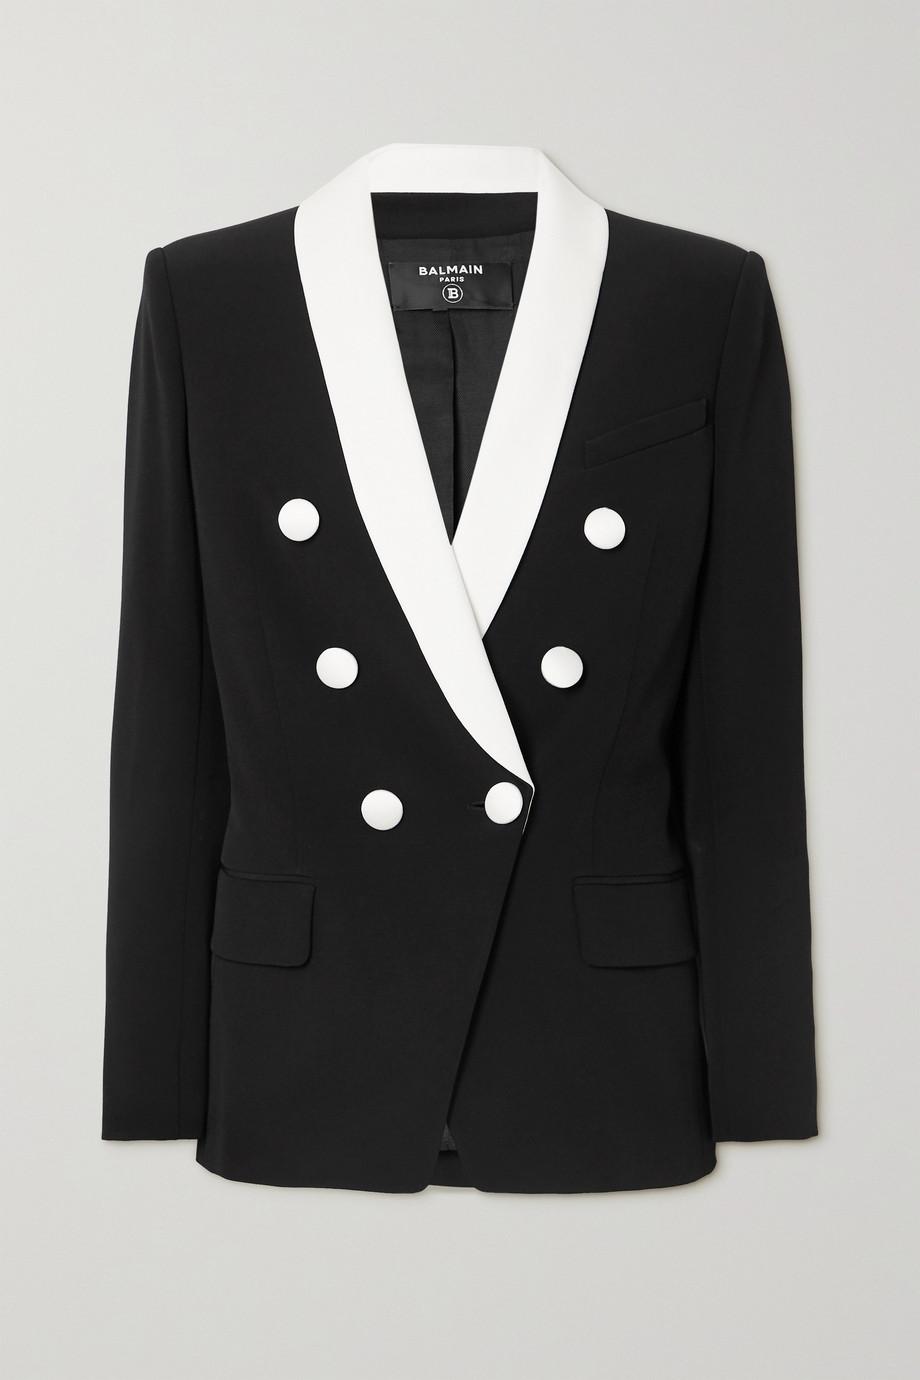 Balmain Double-breasted two-tone crepe blazer